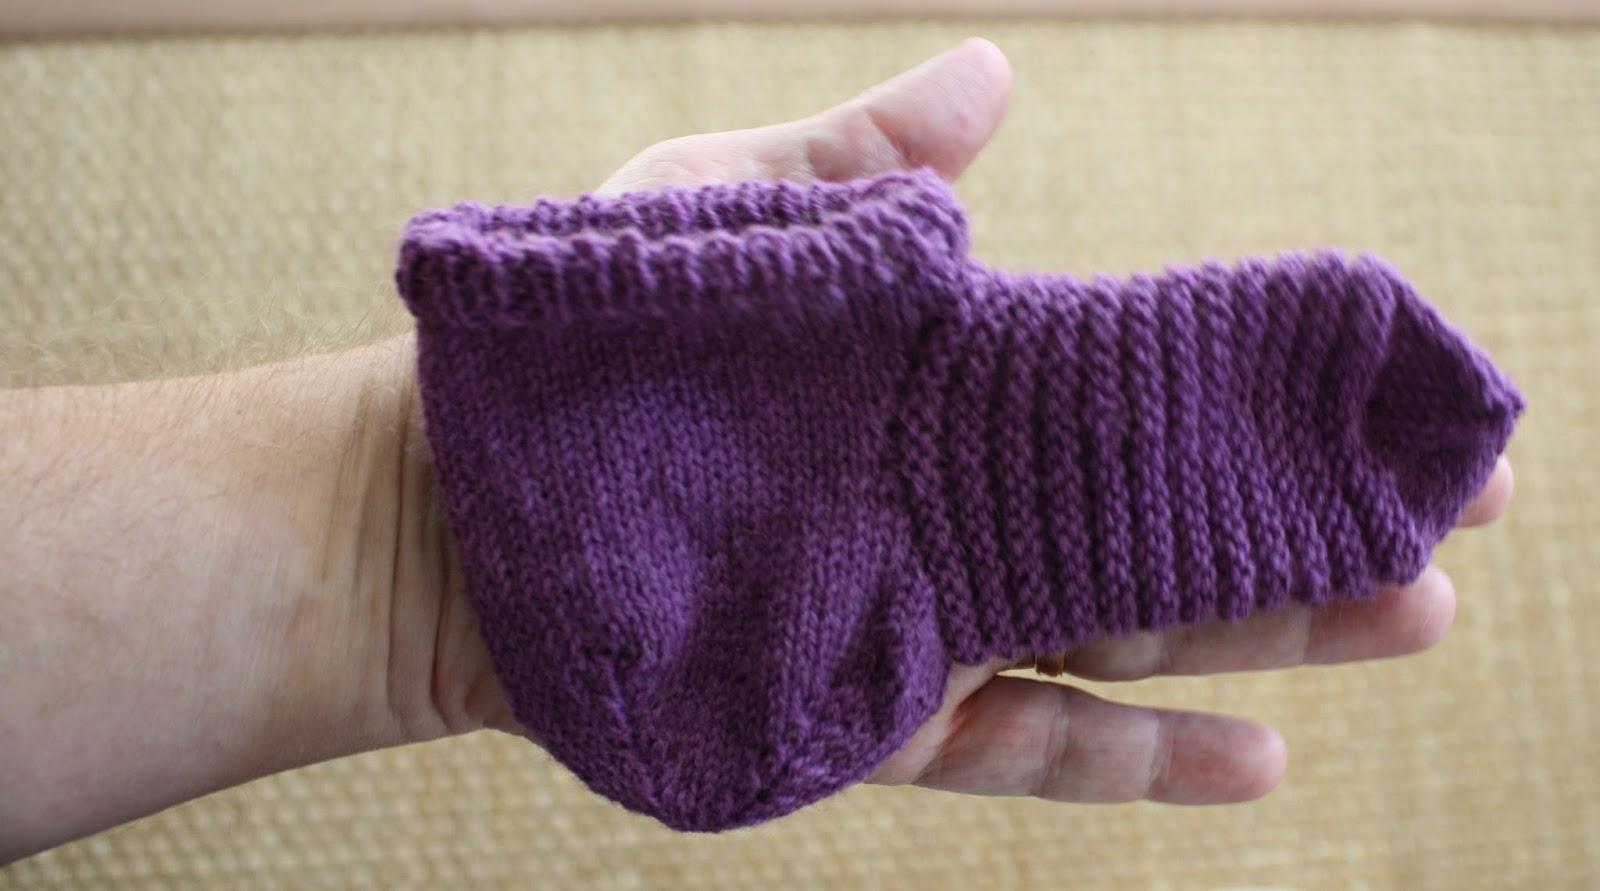 Willy Warmer Knitting Pattern : QueerJoes Knitting Blog: Desiging 3-Dimensional Knitting